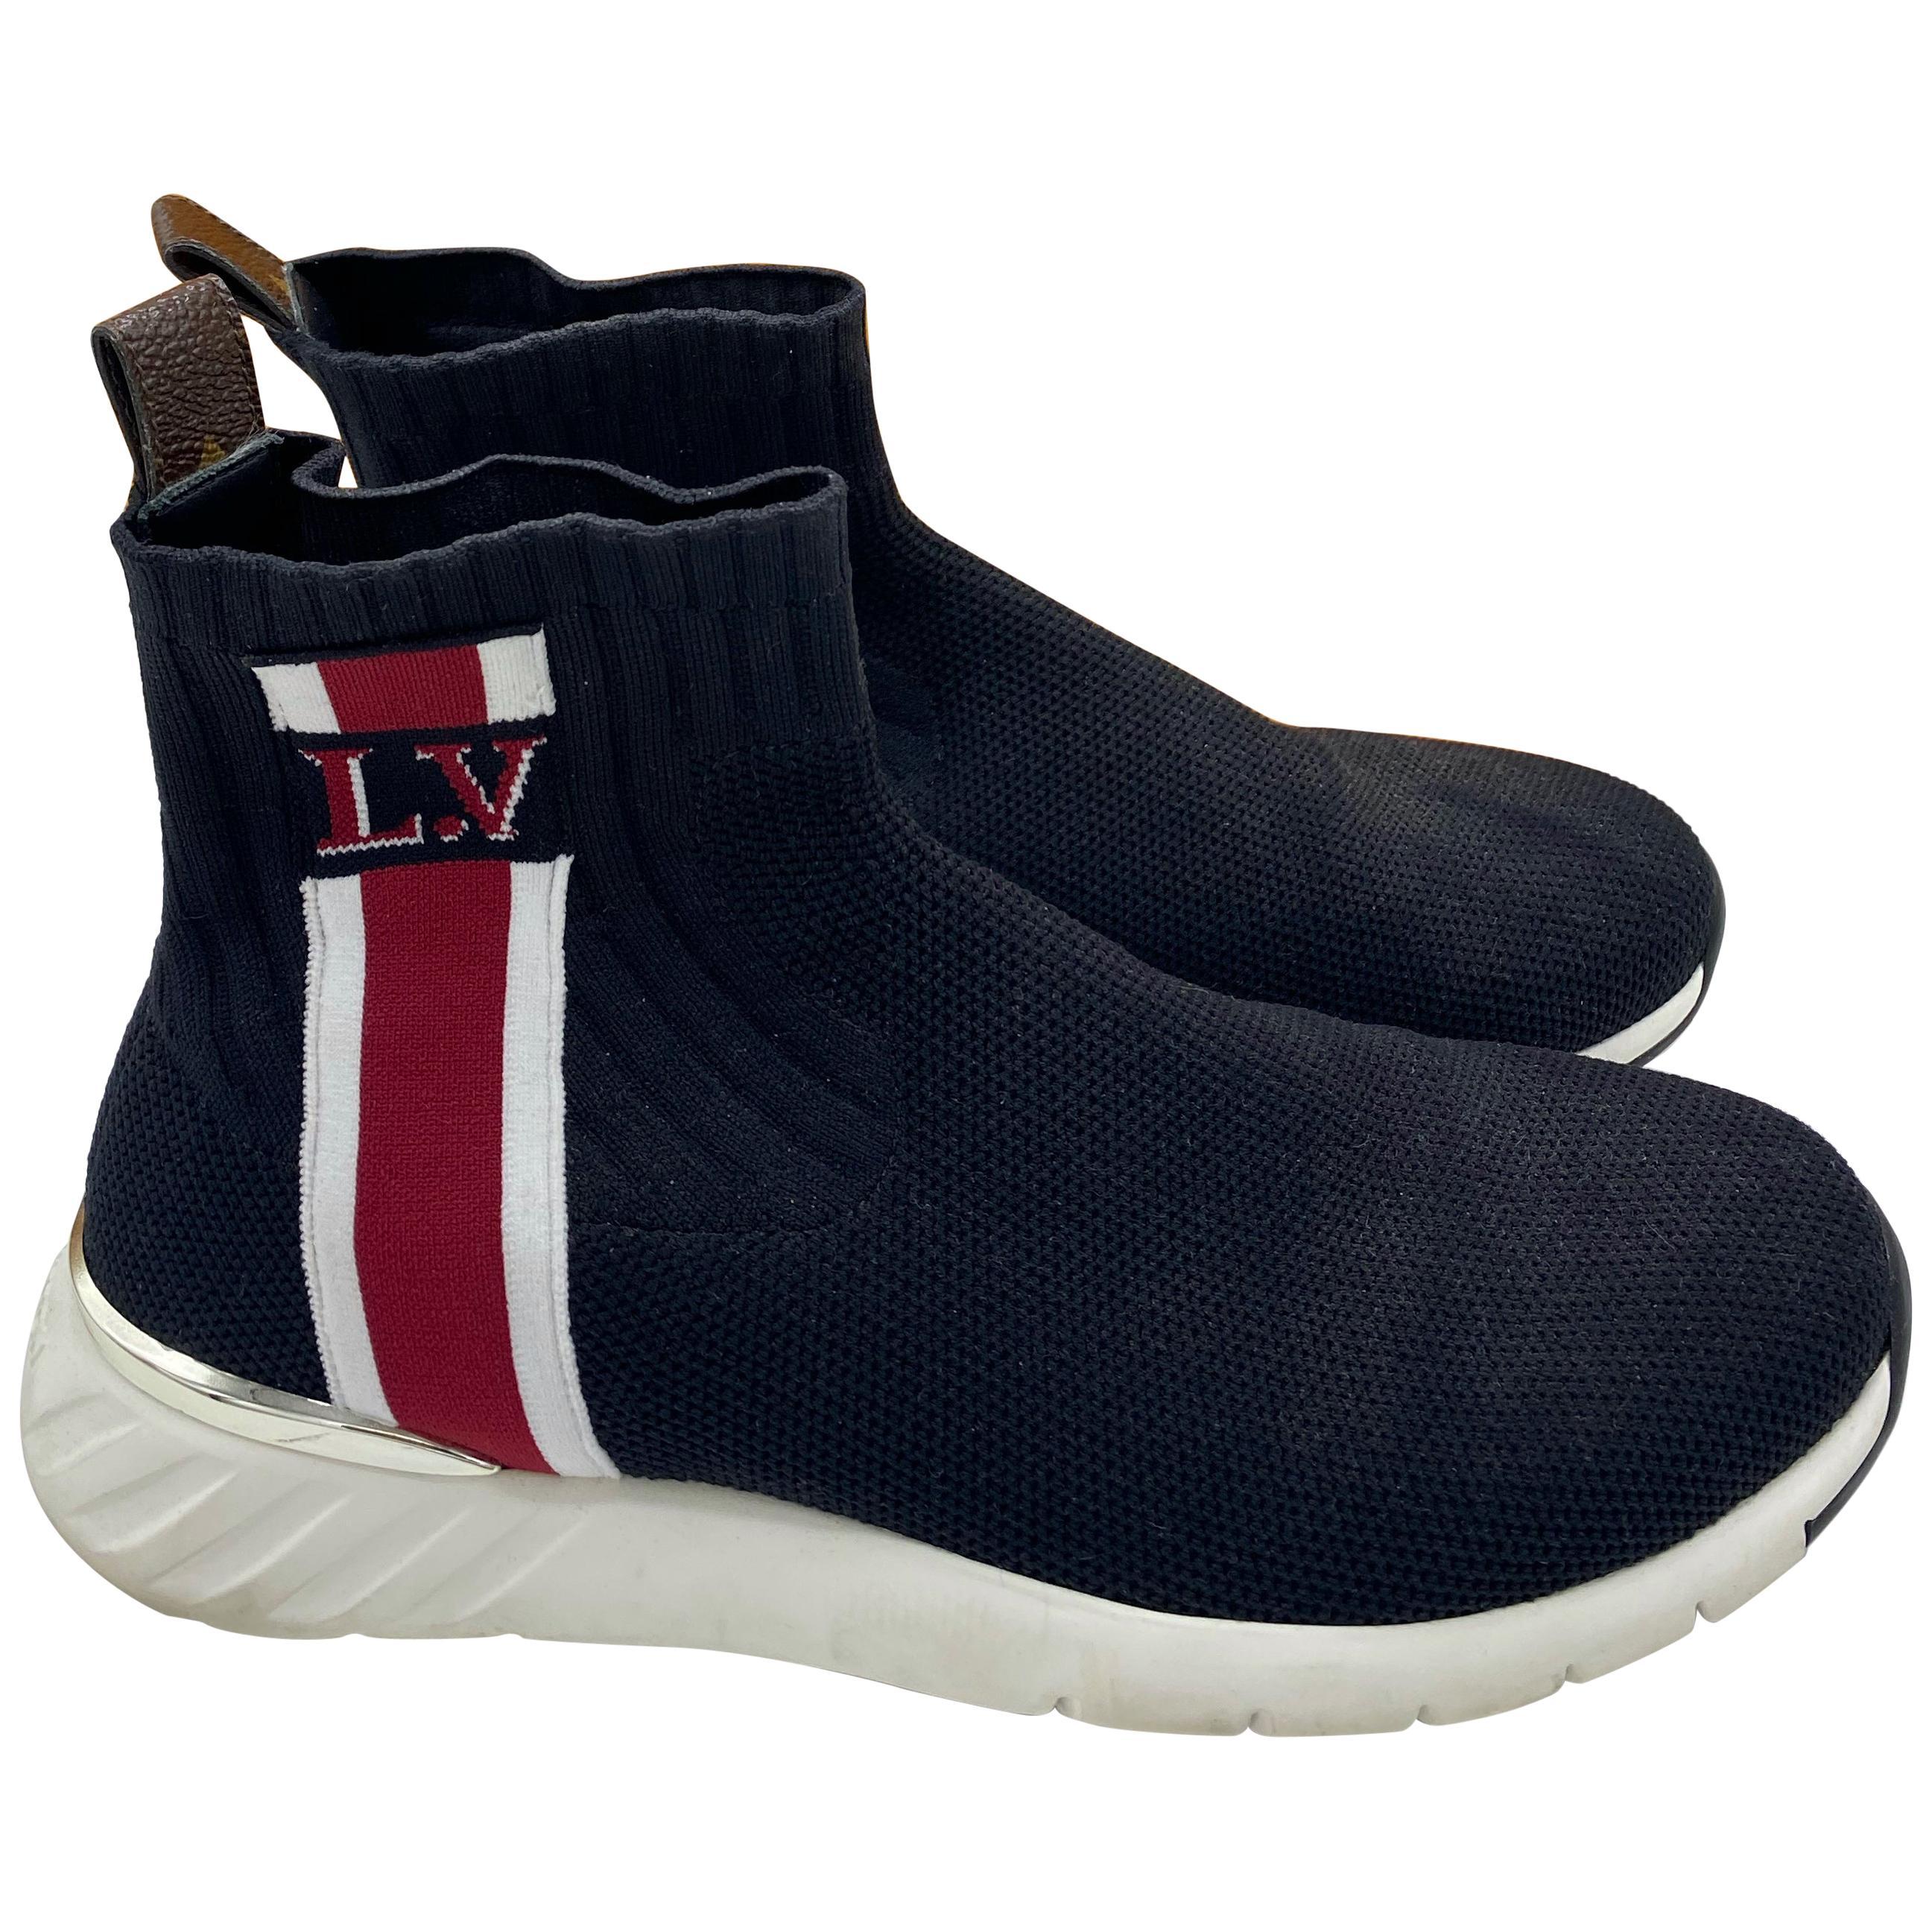 LOUIS VUITTON Black Aftergame Sock Sneaker Boots, Size 39